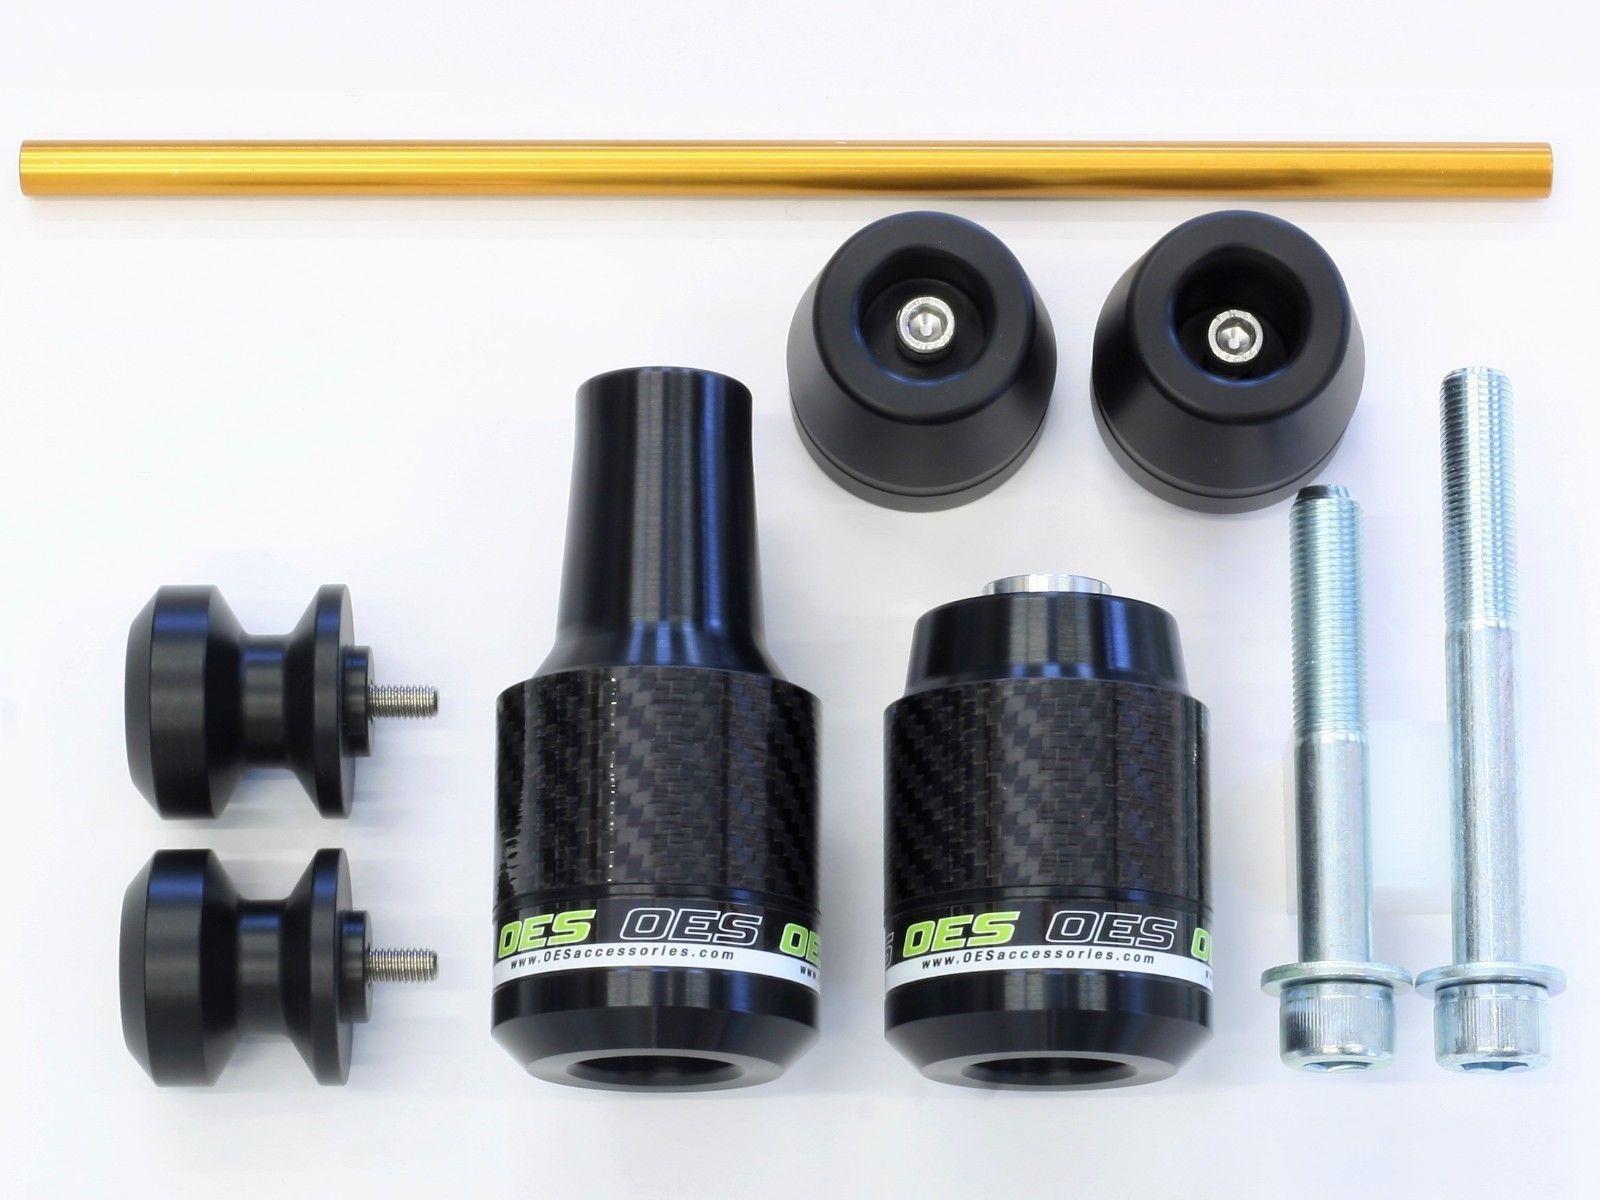 OES Carbon Frame Sliders Spools Fork Sliders 2017 2018 Yamaha FZ-10 MT-10 No Cut